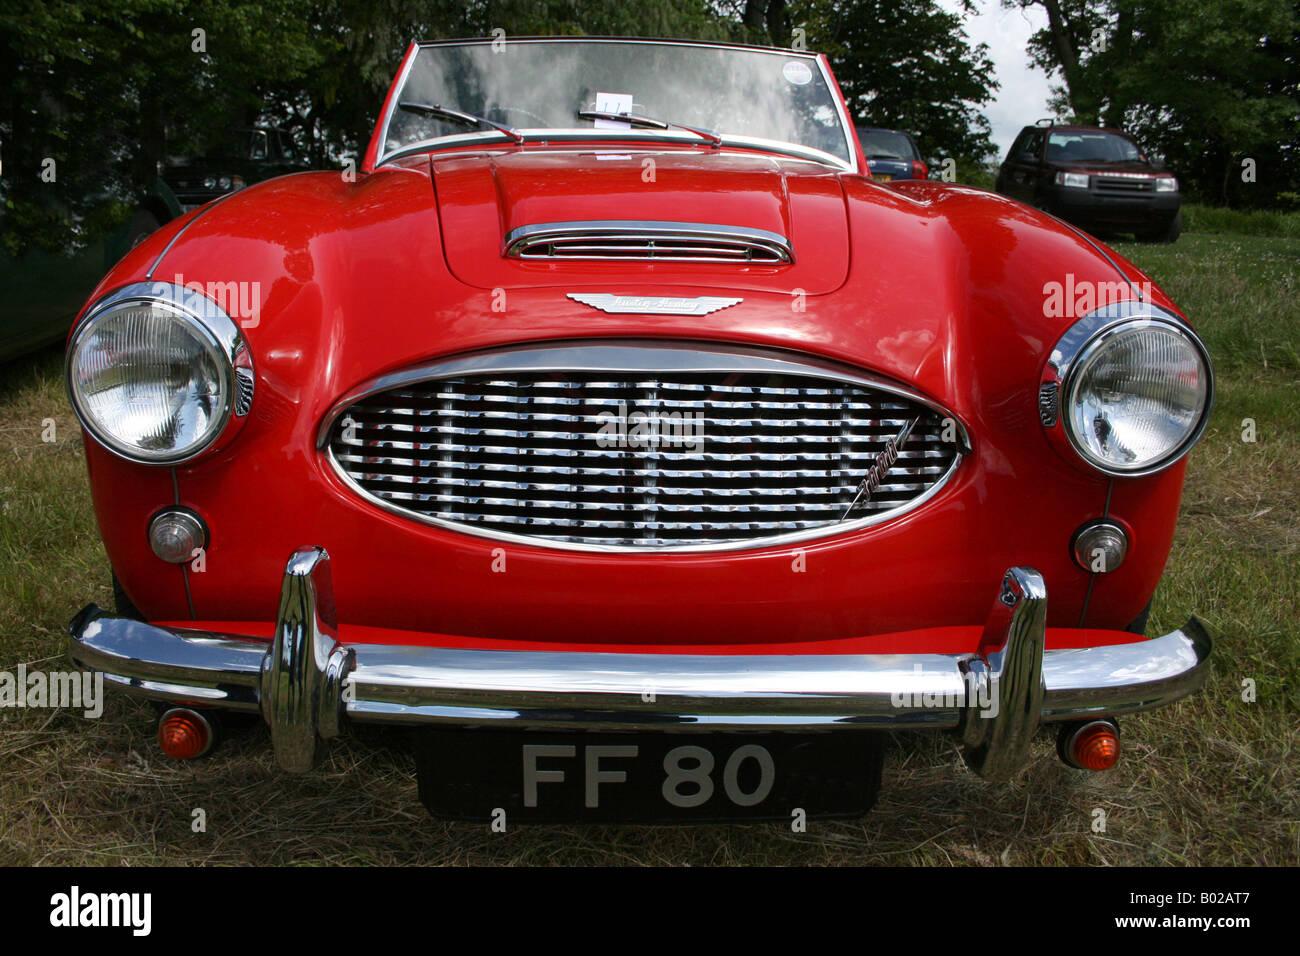 Rot Austin Healey Sportwagen. vordere Chrom-Kühlergrill, Motorhaube. Horizontale. 1960er Jahren horizontale Stockbild